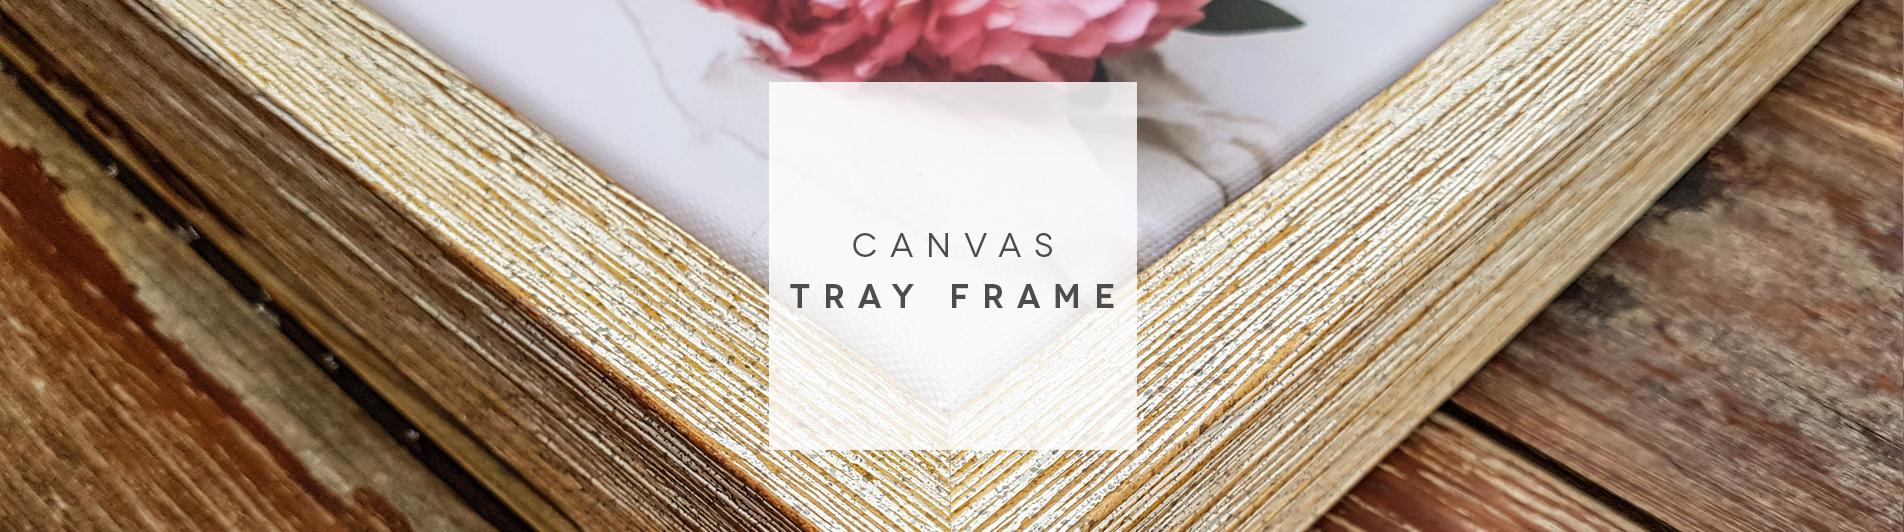 95d087b5cdf Canvas Tray Frame